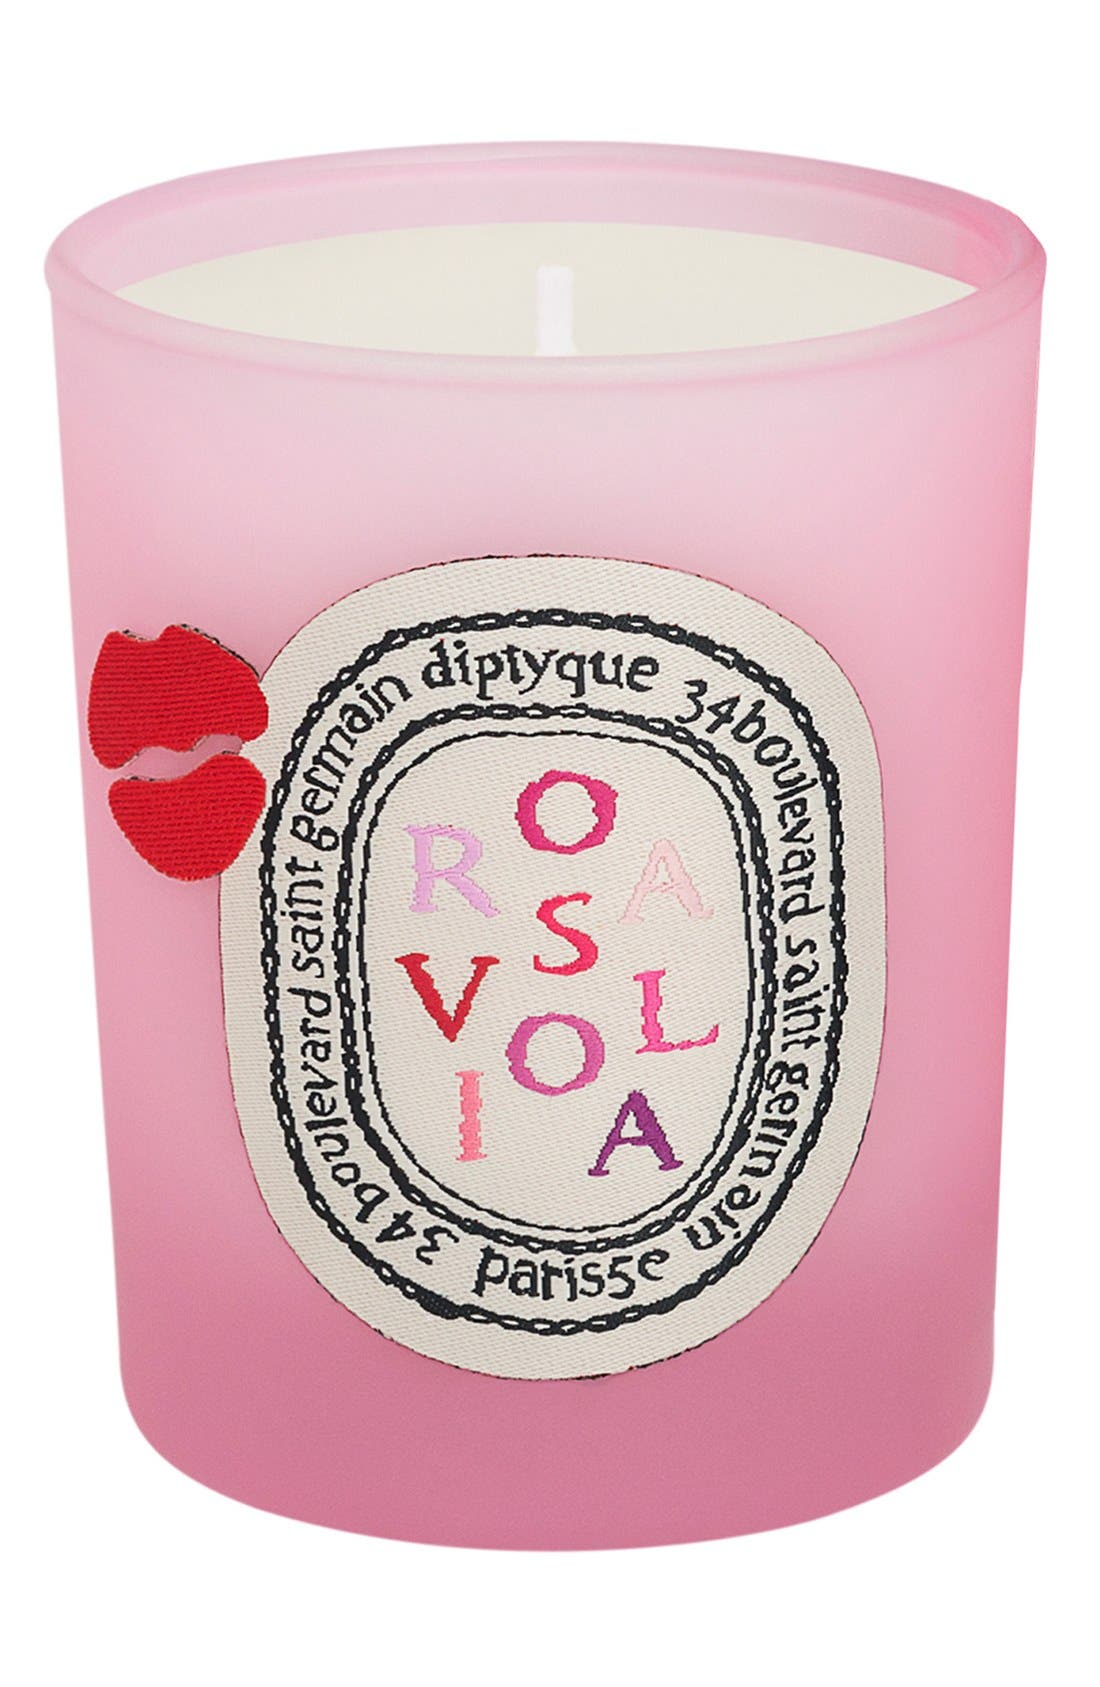 'Rosaviola' Scented Candle,                             Alternate thumbnail 2, color,                             000